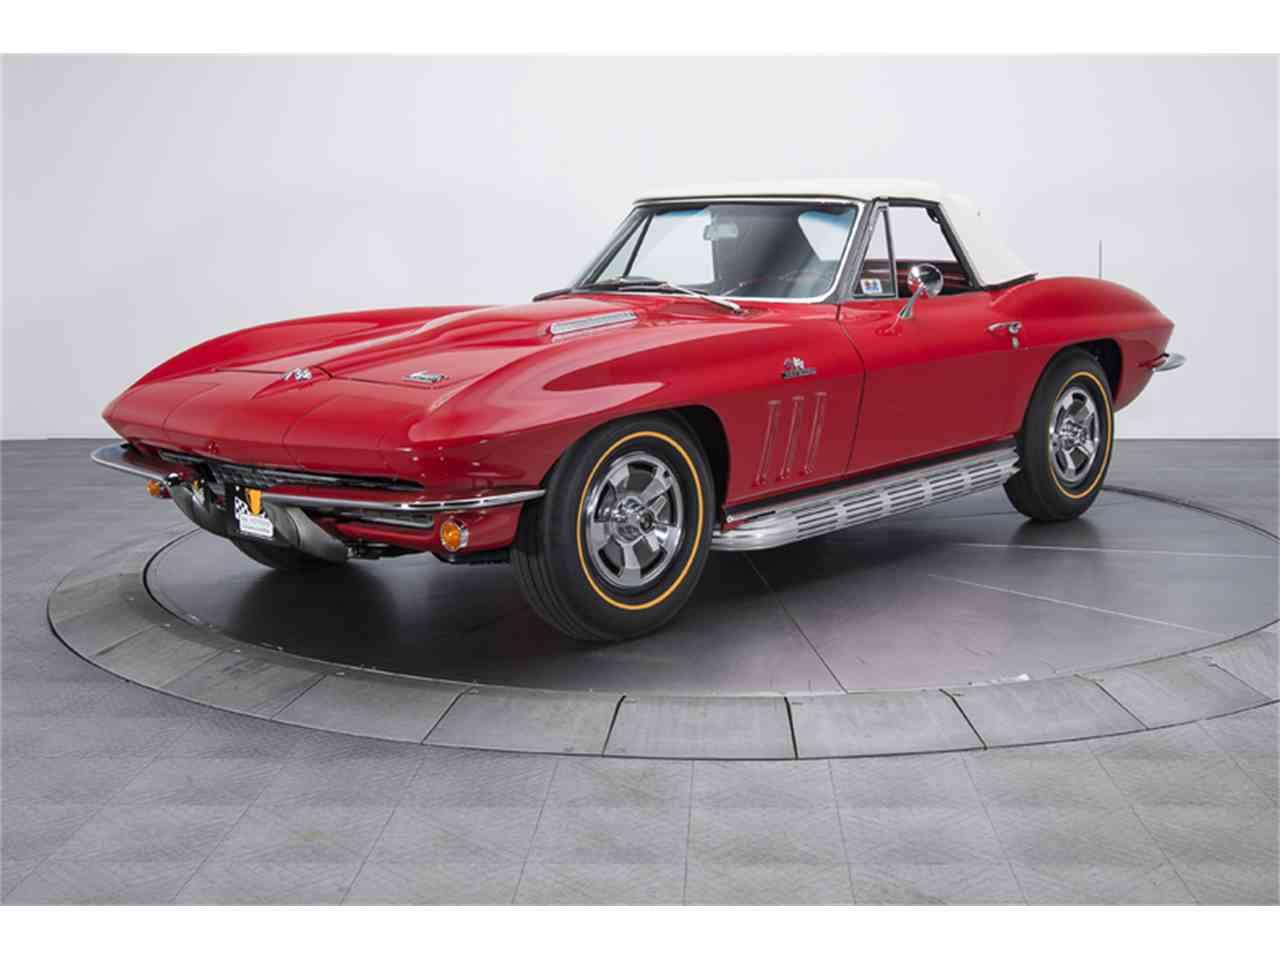 1966 Chevy Corvette Stingray